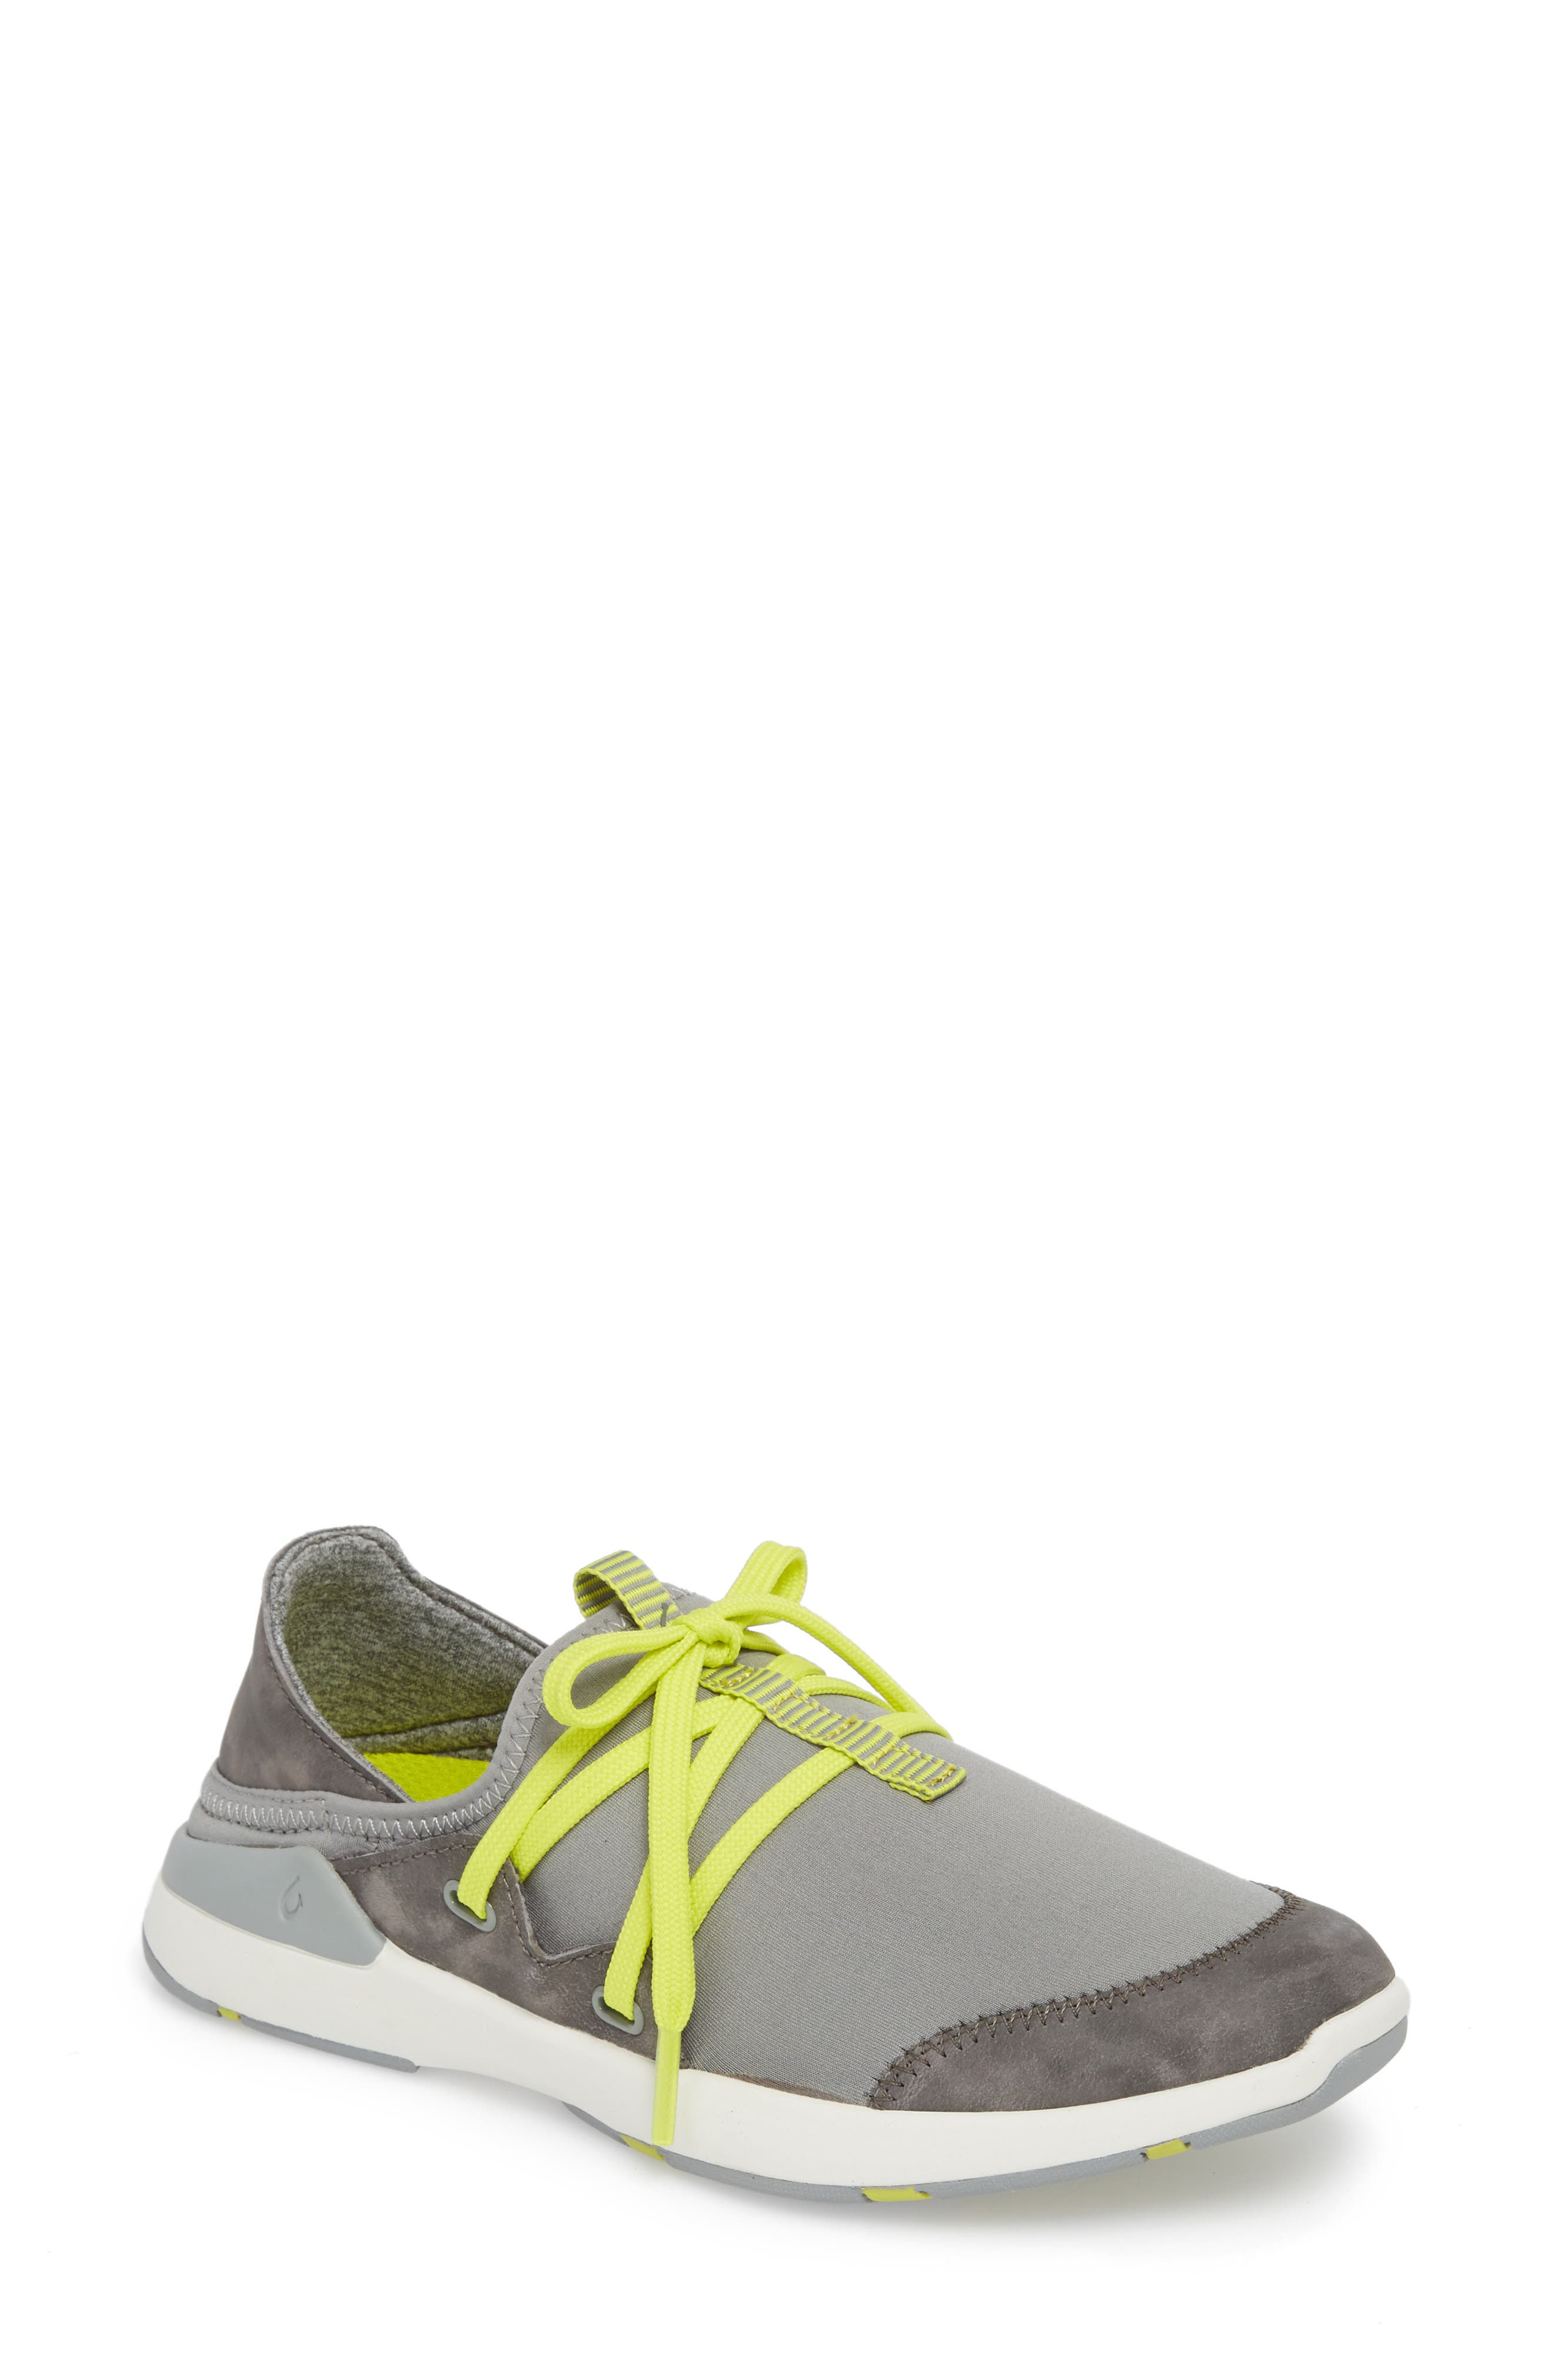 Olukai Miki Li Convertible Sneaker, Grey